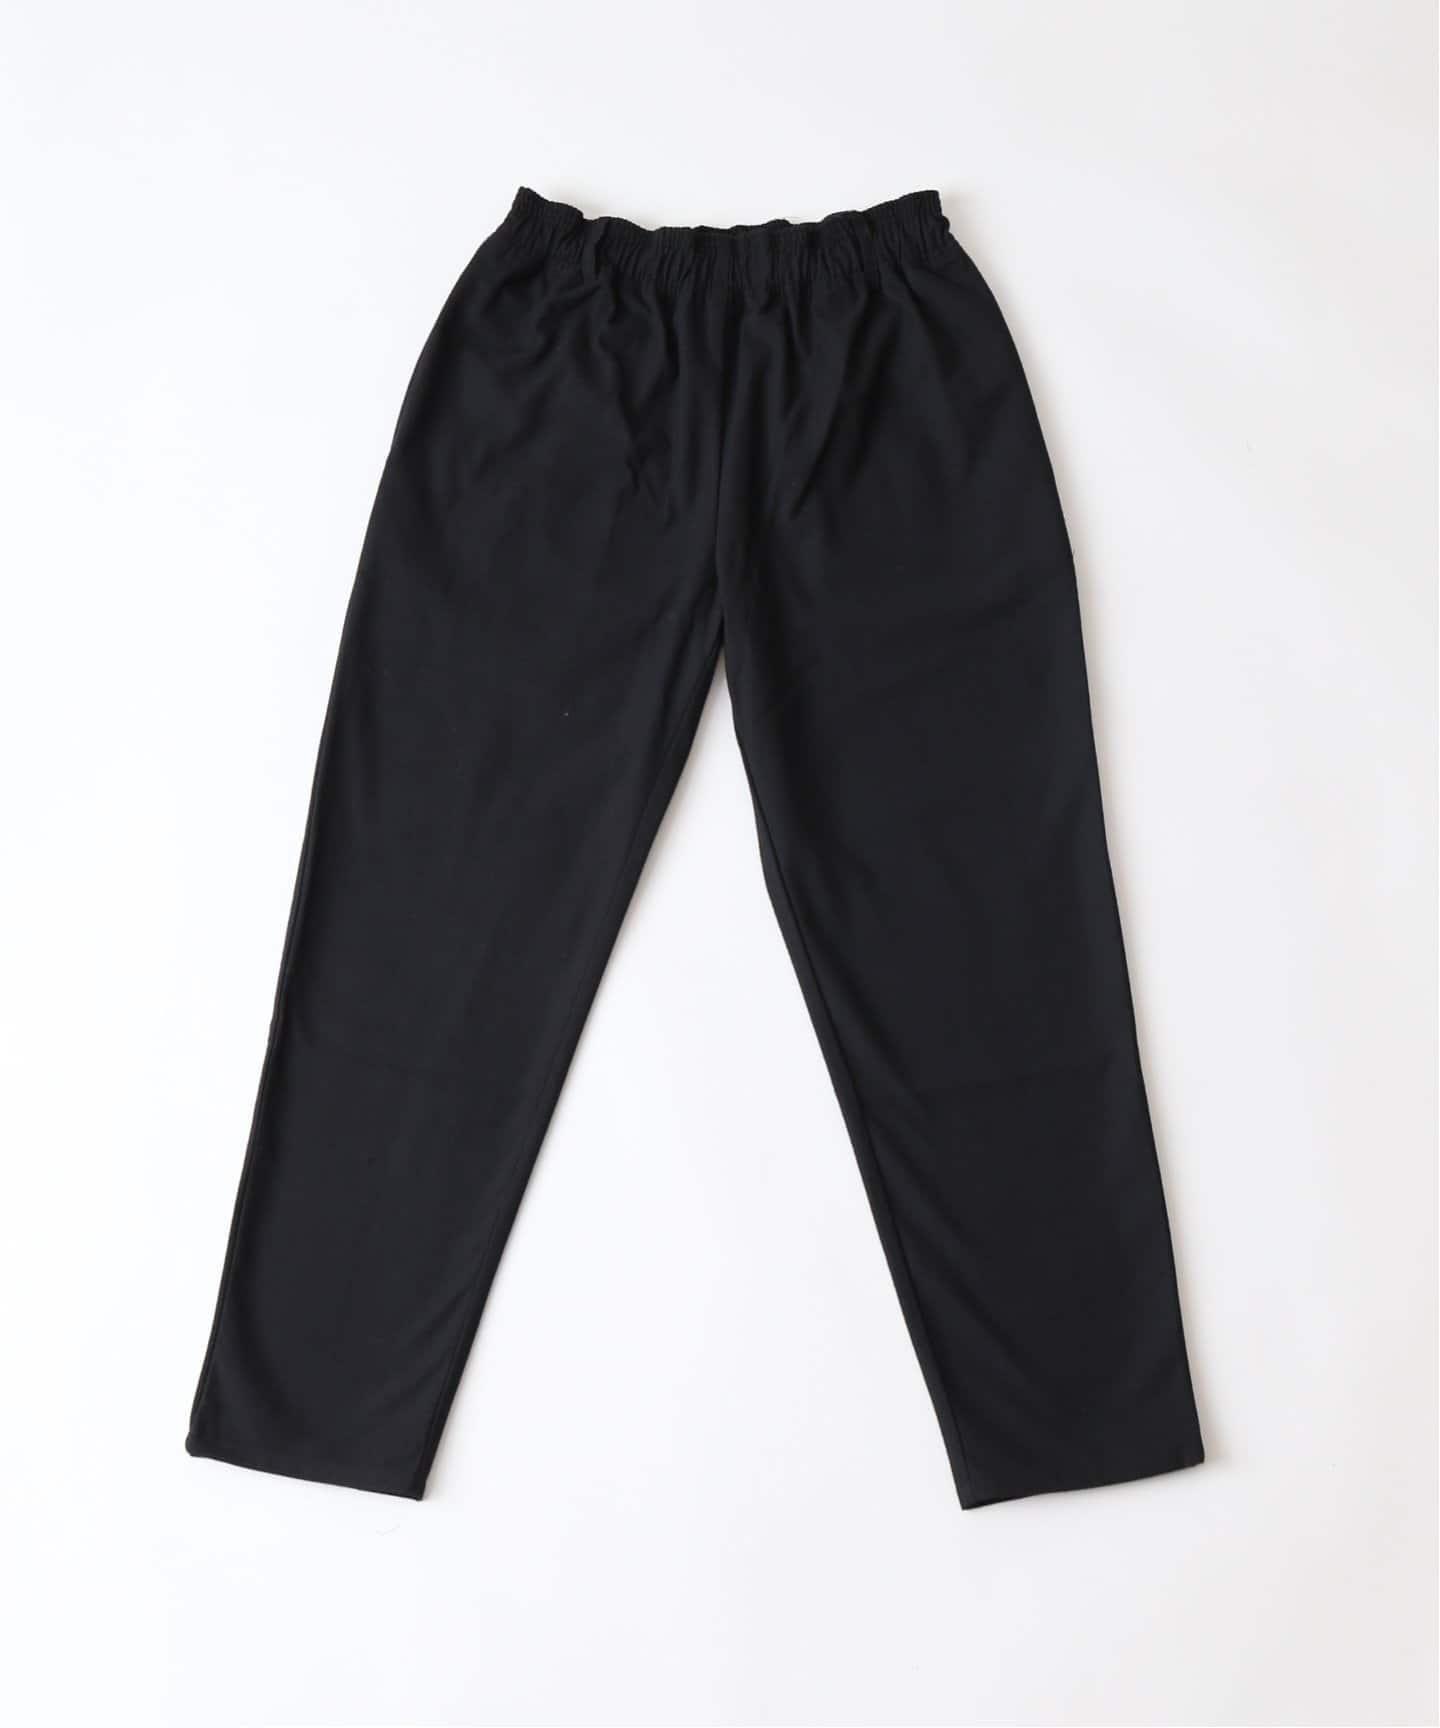 B.C STOCKのパンツ・ズボン/パンツ・ズボン全般|ブラック